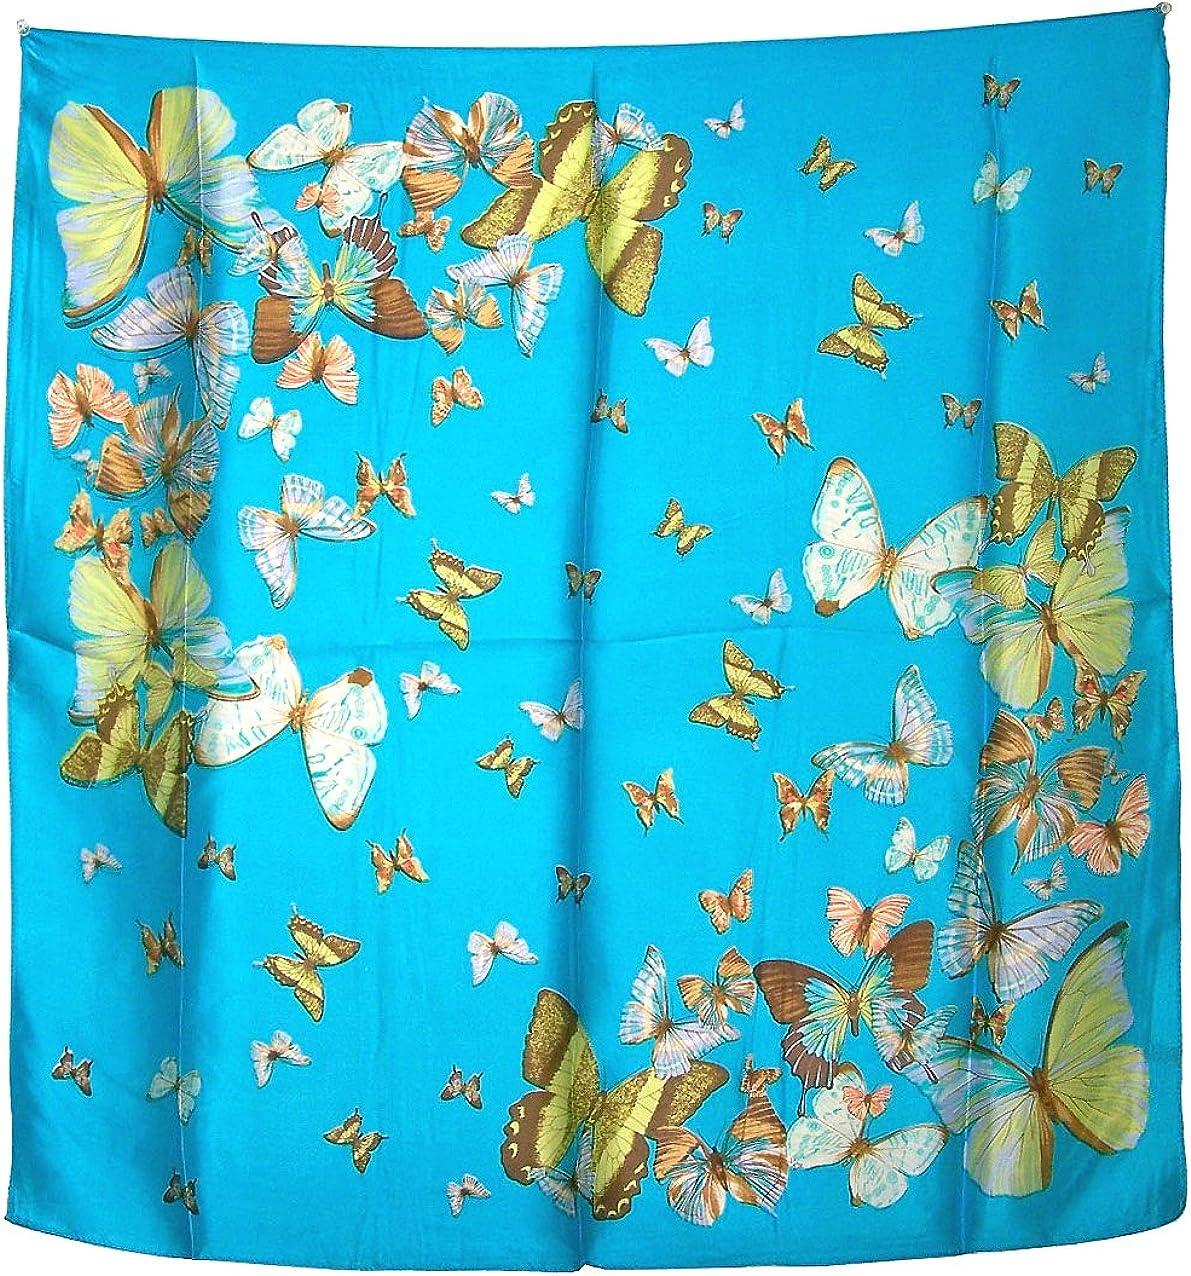 New 100/% Satin Silk Scarf Unique Butterfly Design